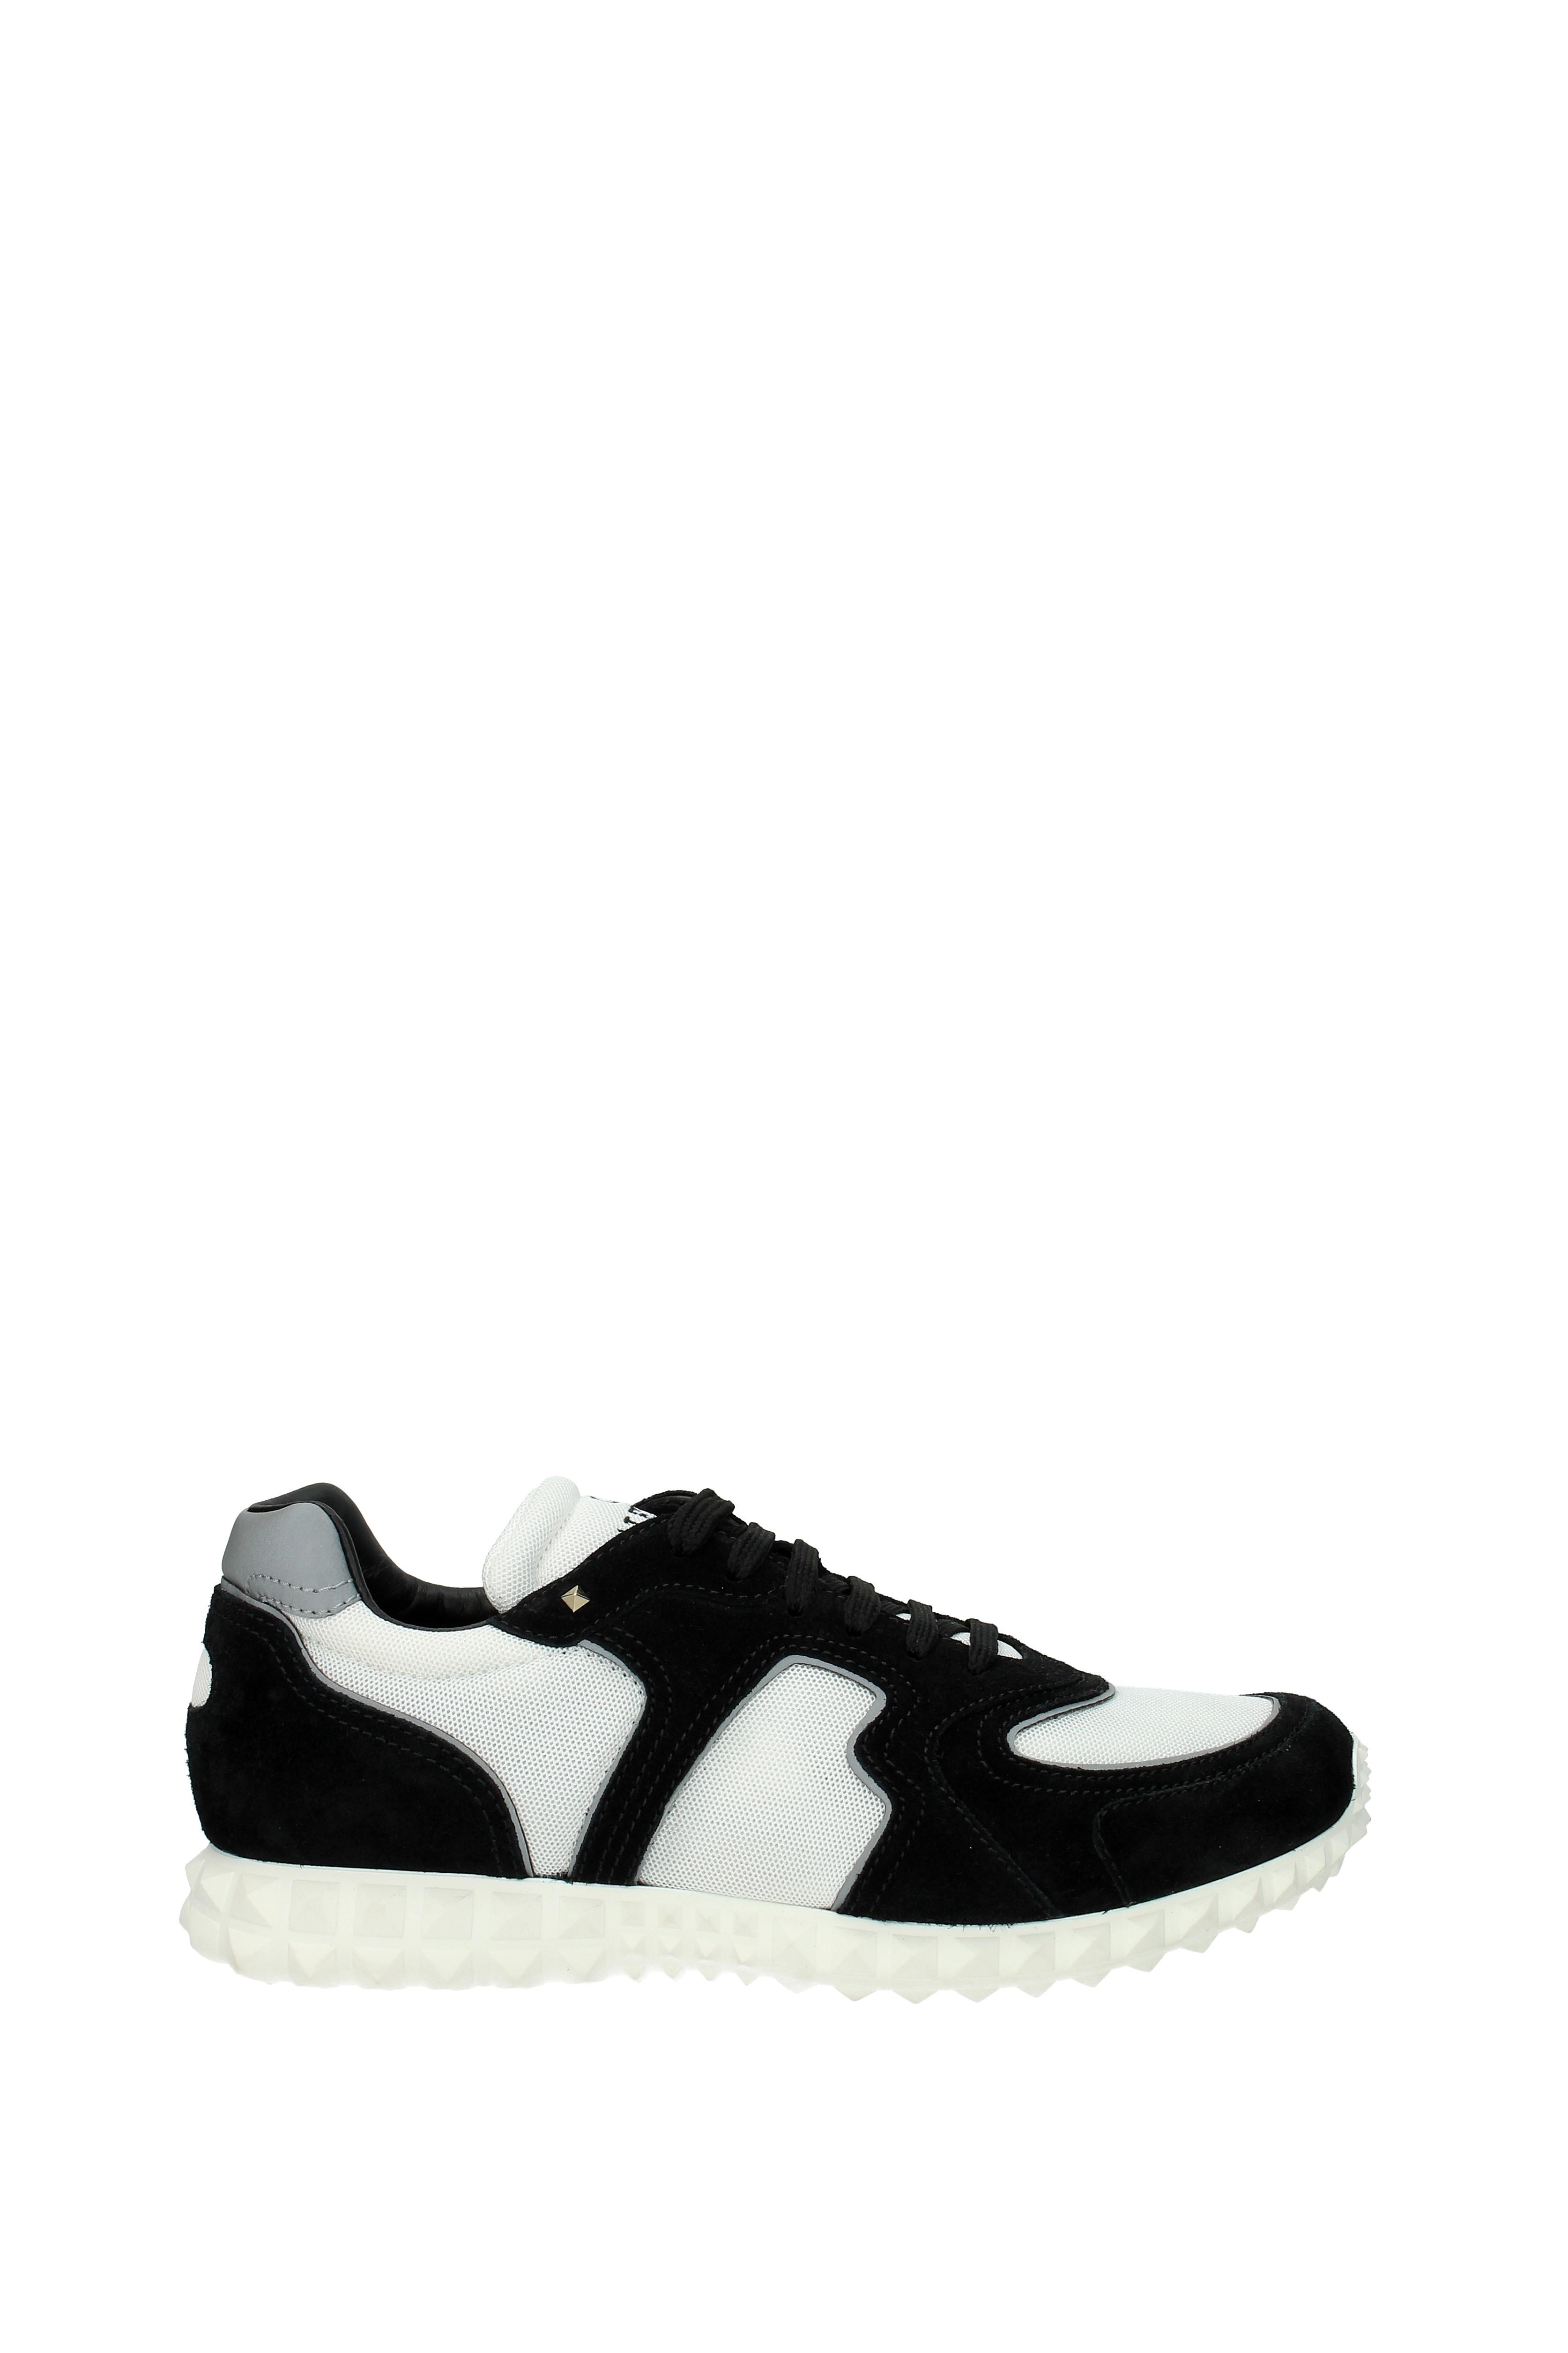 Sneakers Valentino Herren Garavani Herren Valentino - Stoff (0S0A40TDG) 8b8bb0